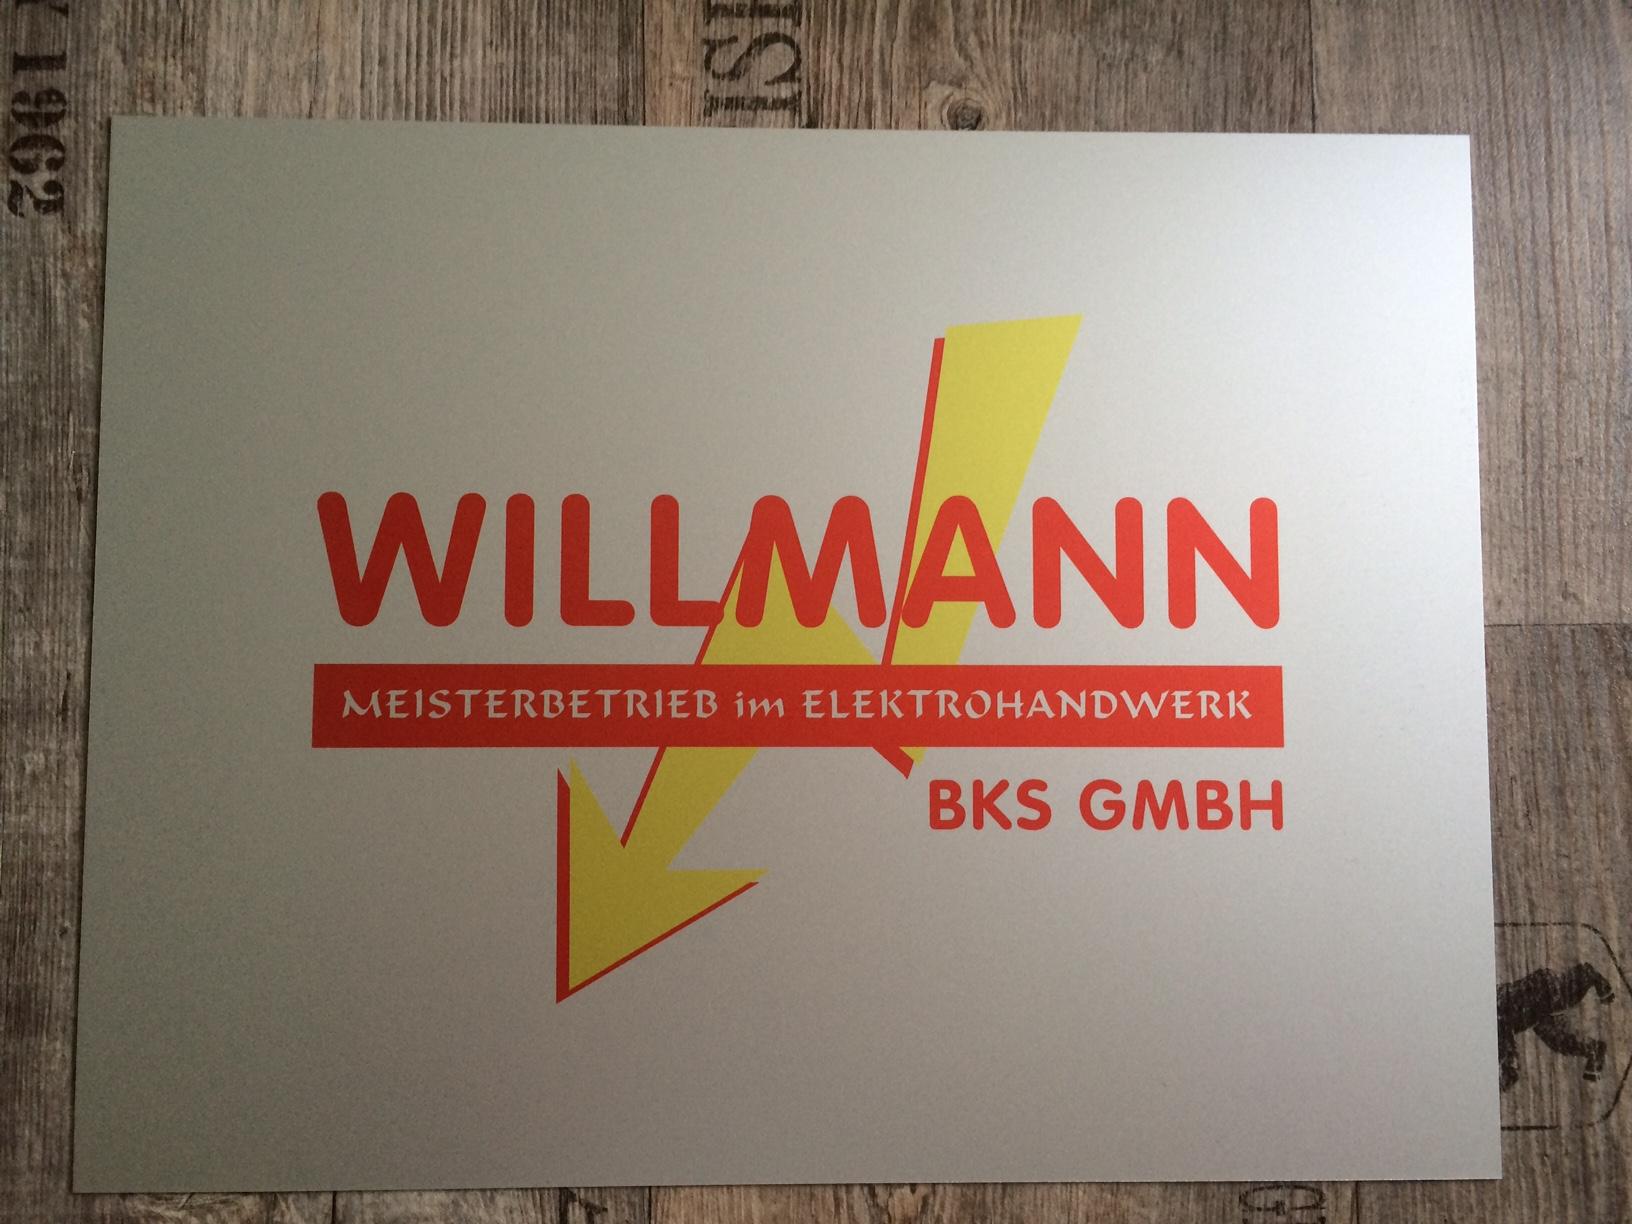 Aluminiumschild mit Sublimationsdruck